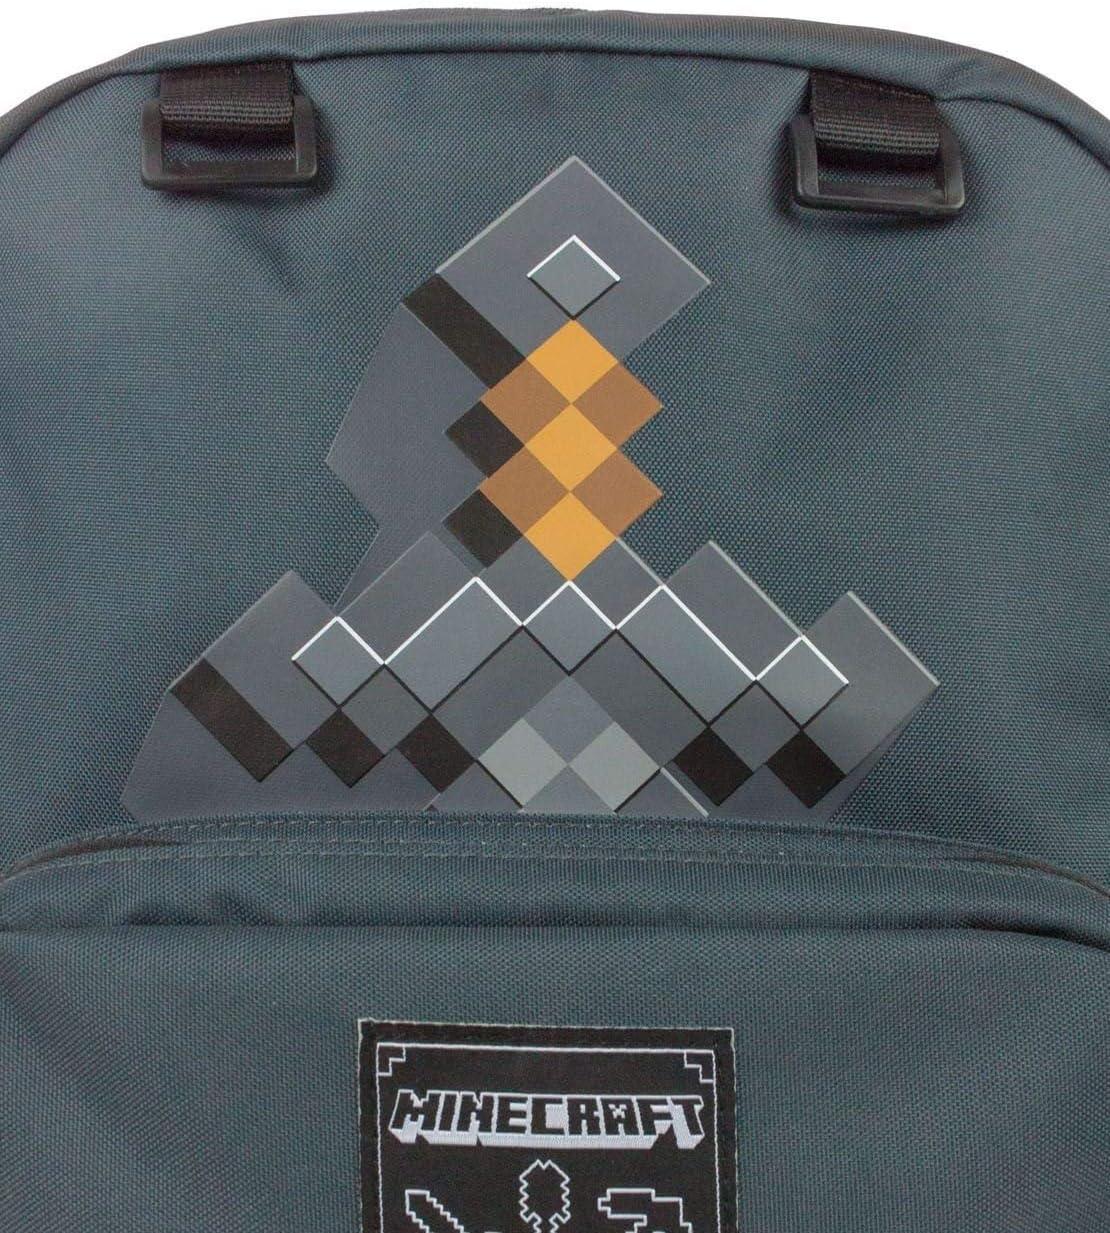 Jinx Minecraft Backpack Bagage Enfant 44 Centimeters Multicolore Various